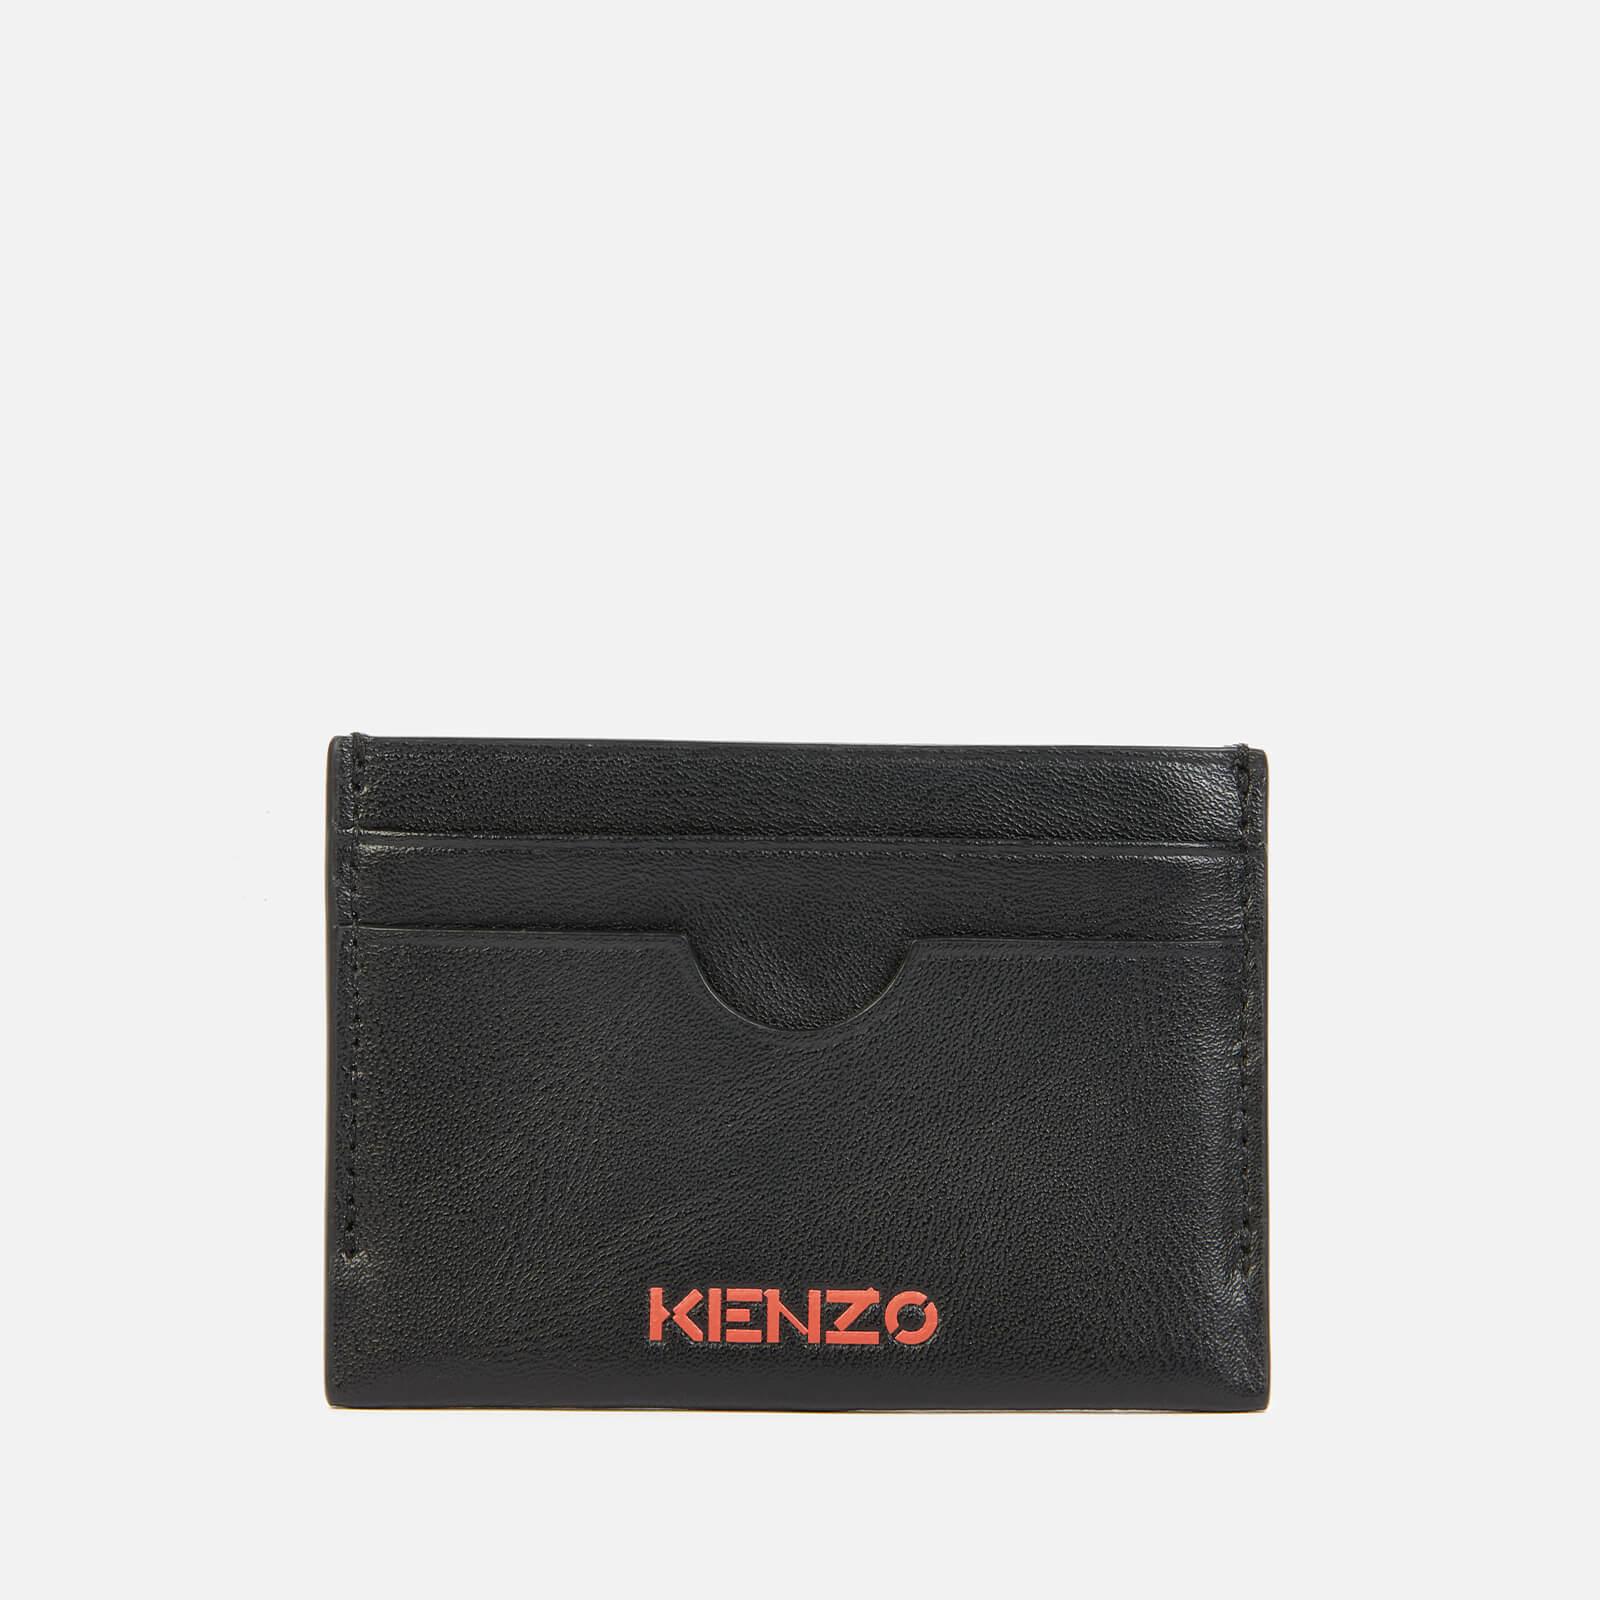 kenzo men's leather cardholder - black